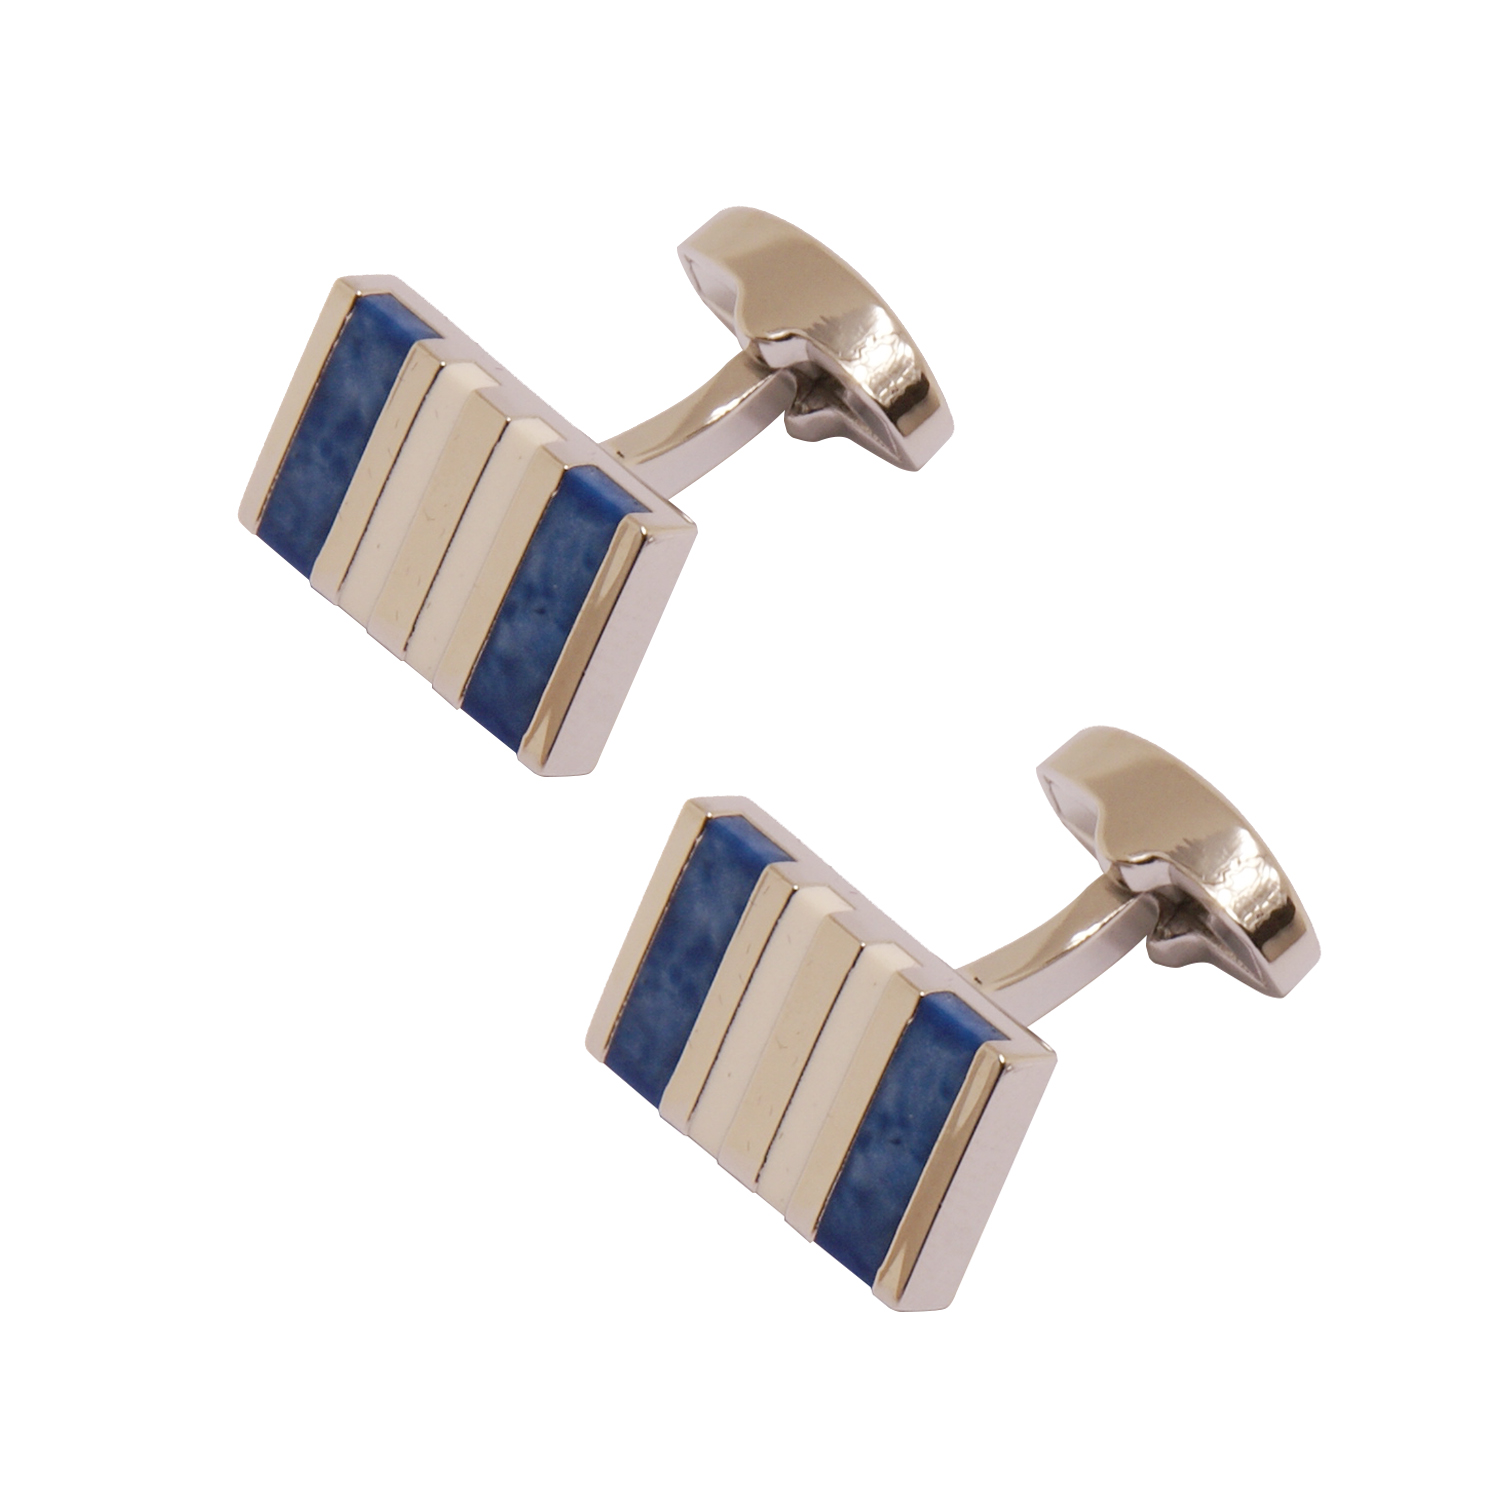 Sophos – Polished Silver with Blue Semi-Precious Stones Cufflinks in Gift Box